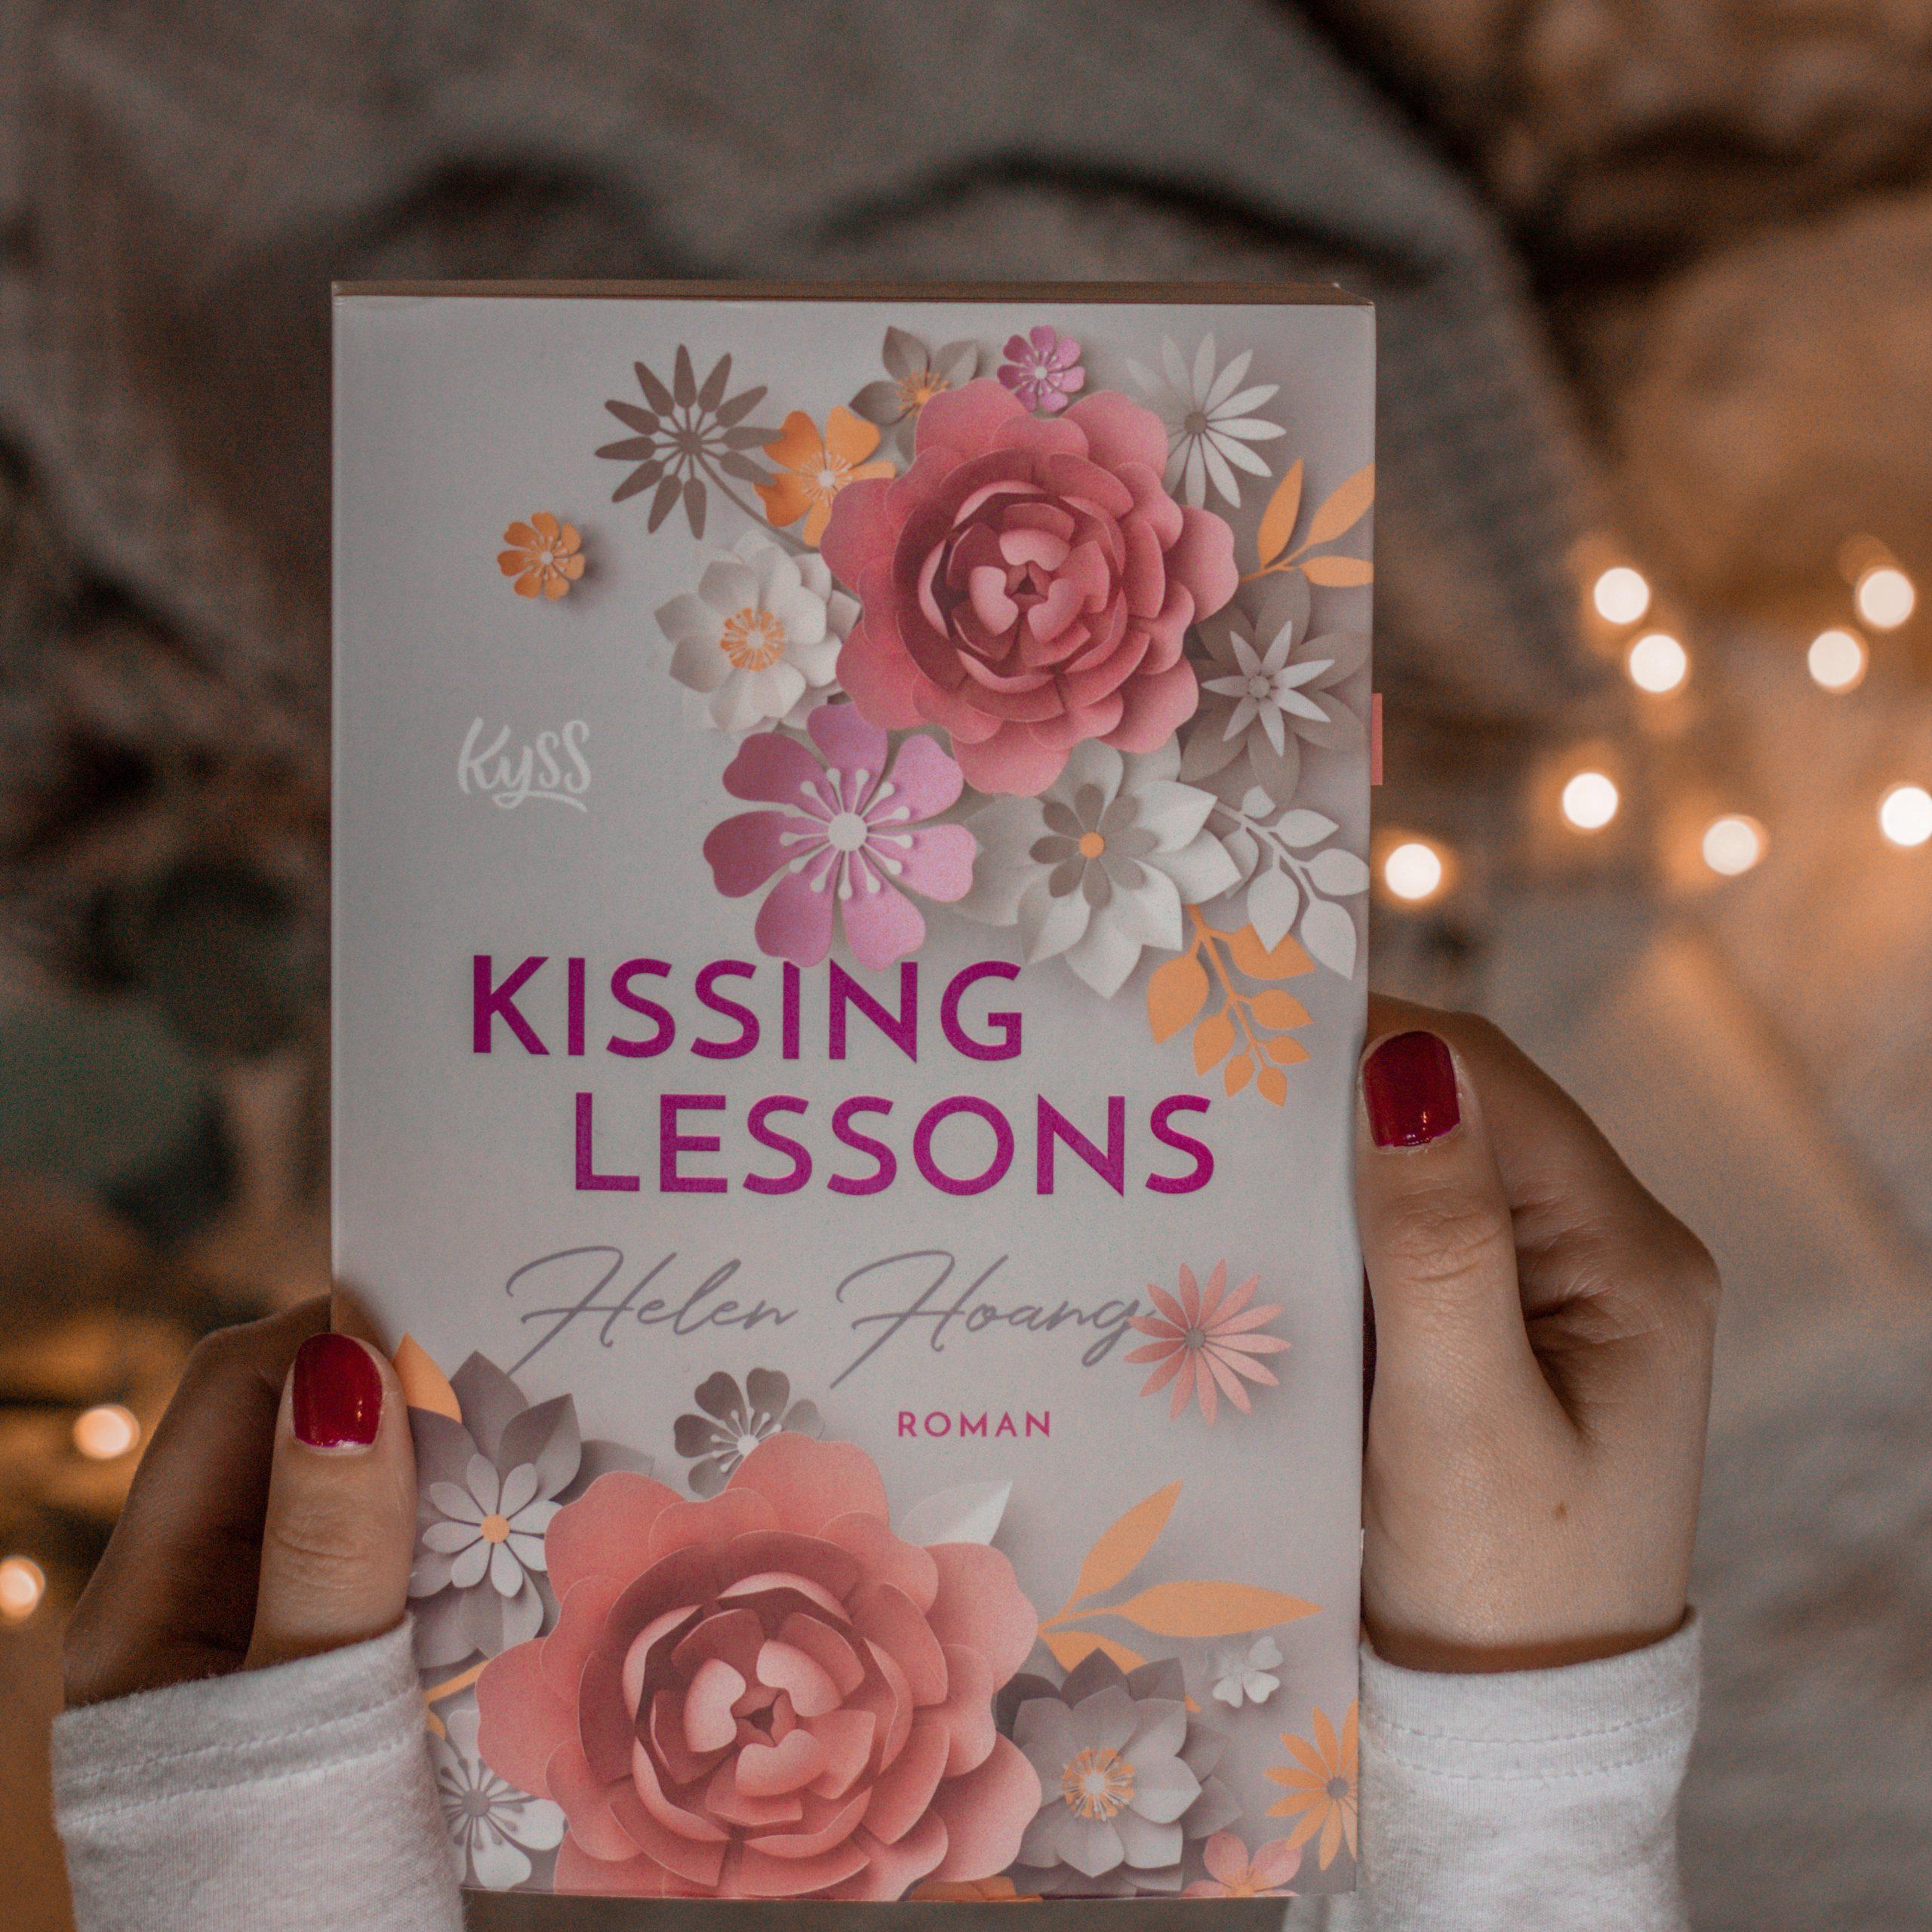 Kissing Lessons – KISS, LOVE, HEART #1 | Helen Hoang